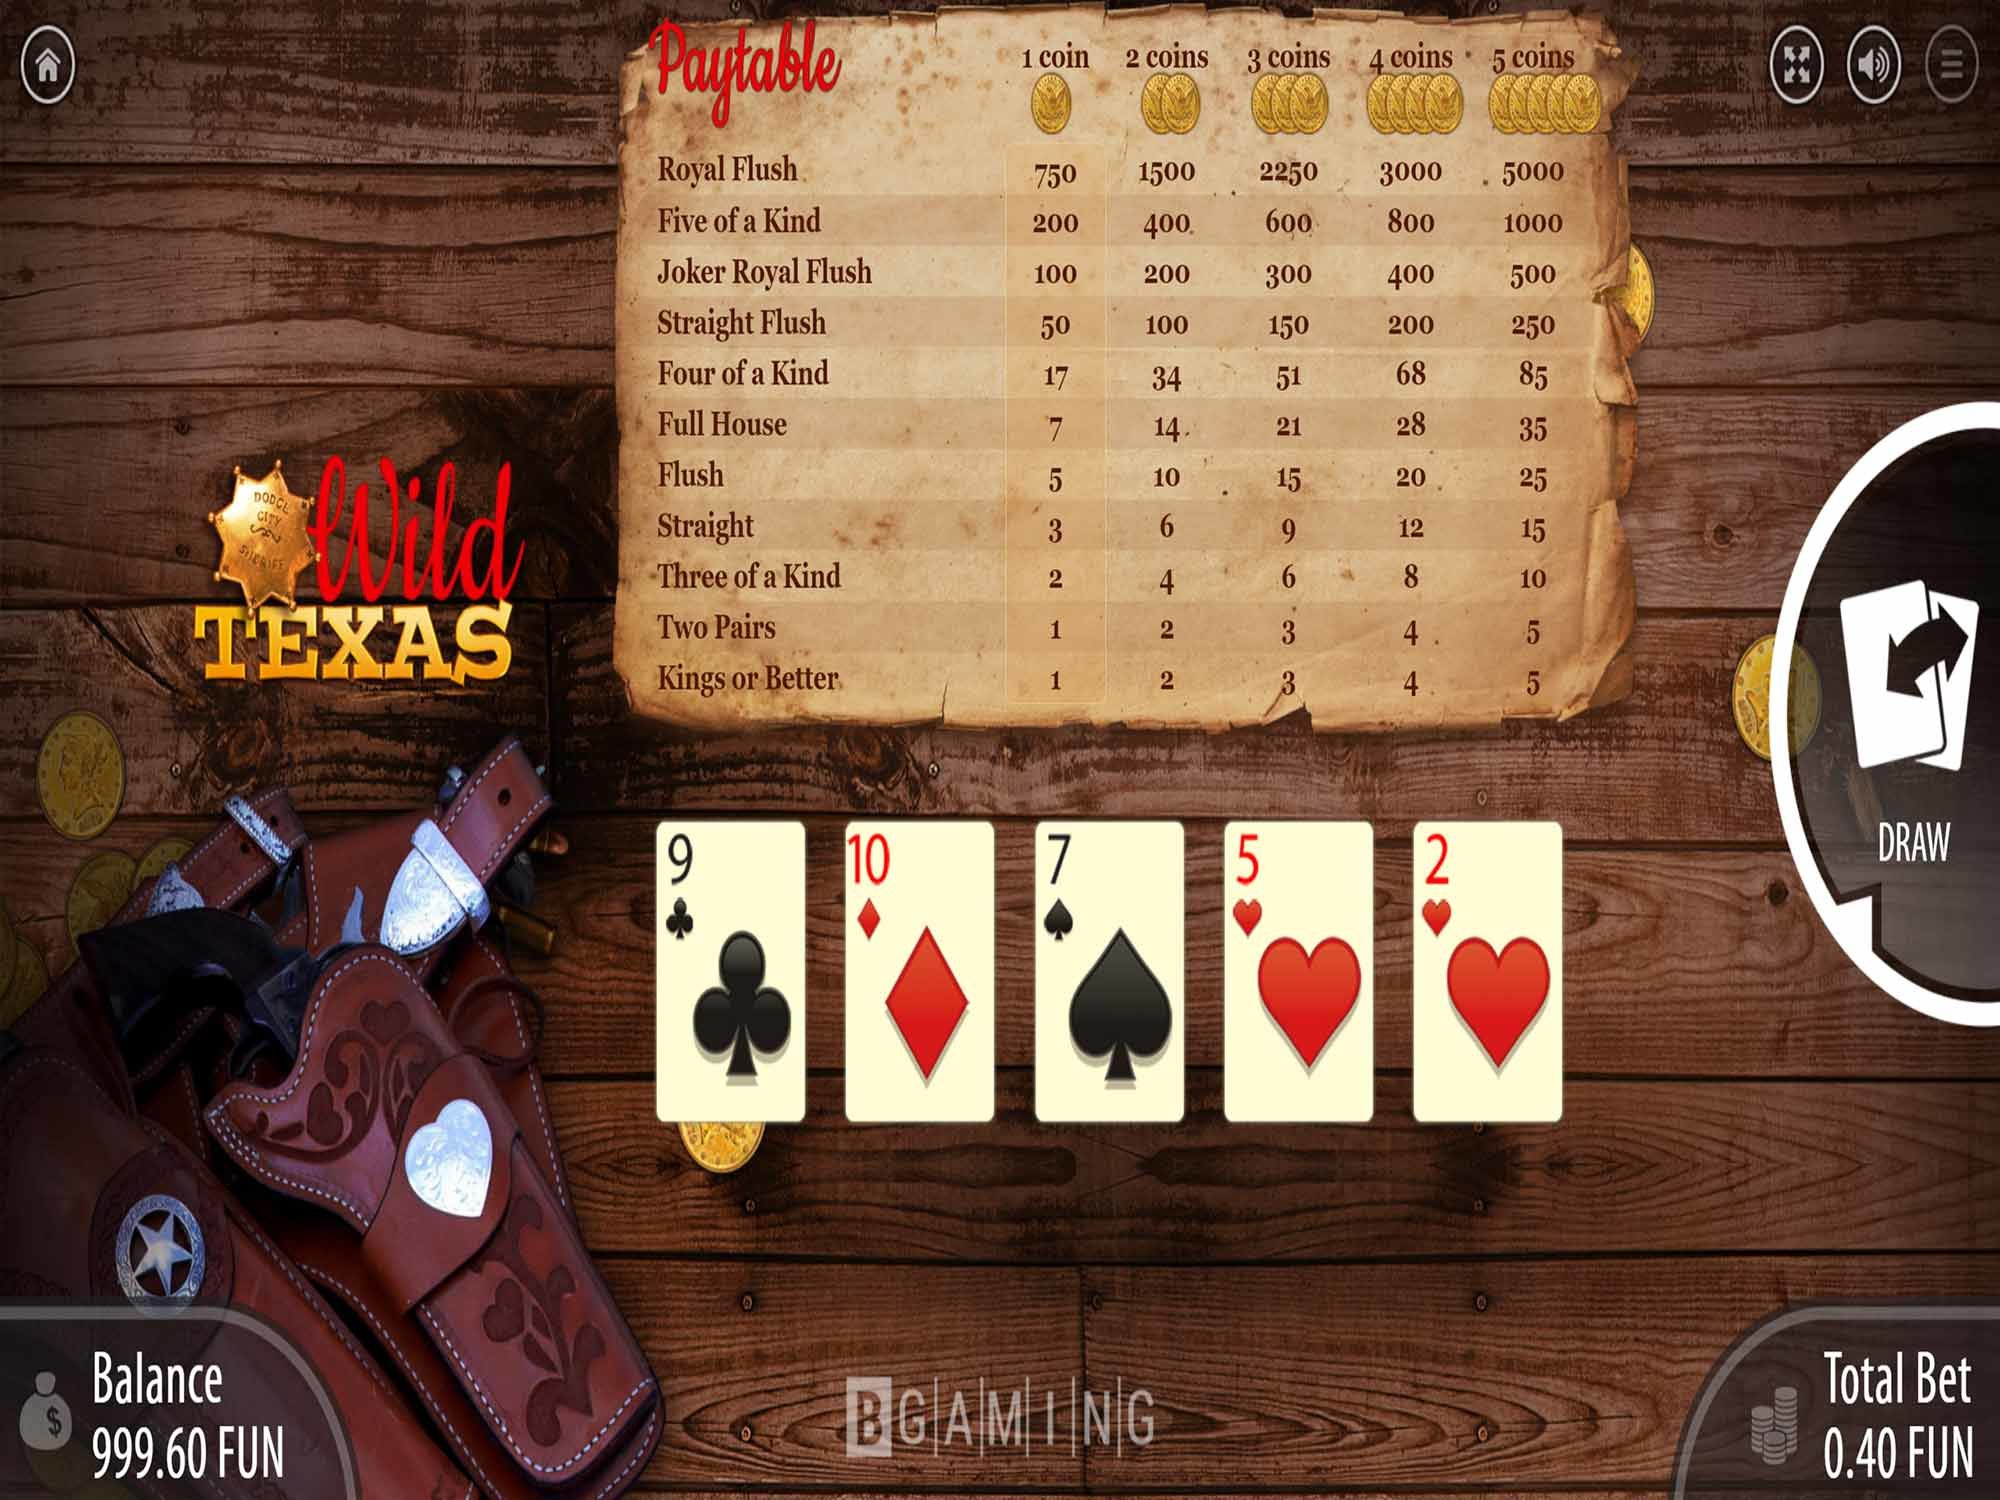 Wild Texas by Bgaming screenshot